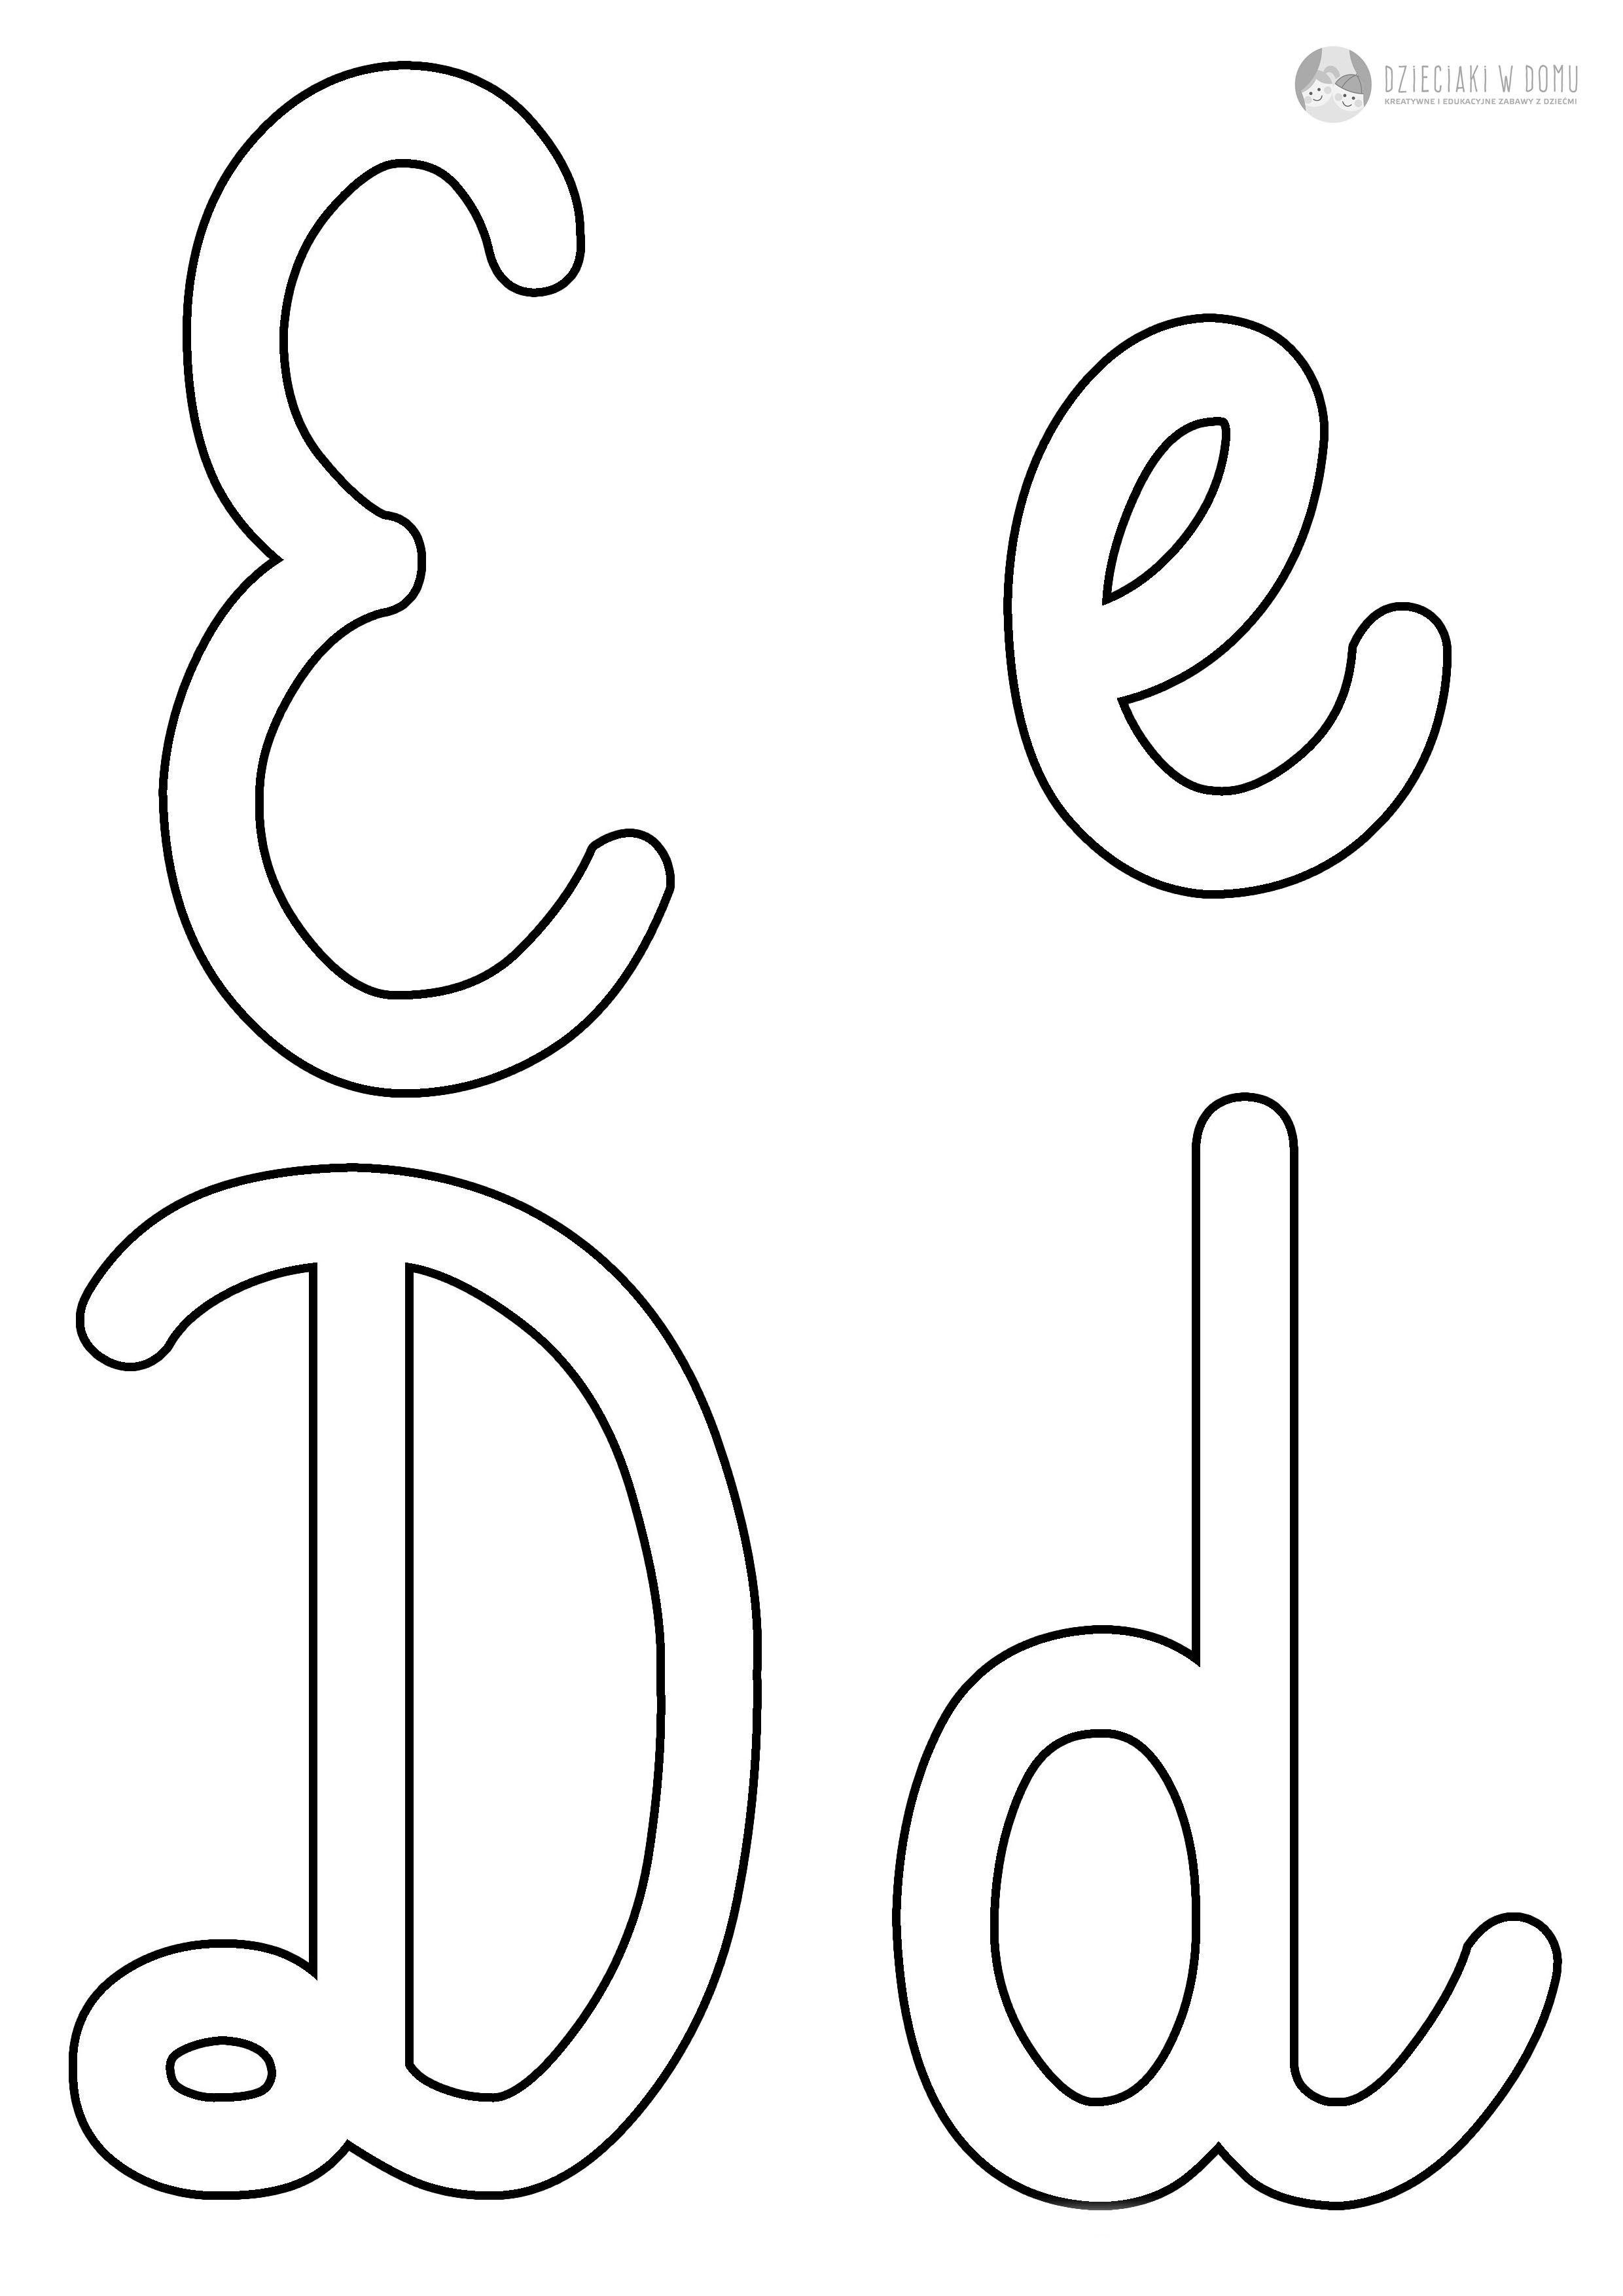 Szablony Liter Do Szorstkich Literek Diy Crafts Letters Montessori